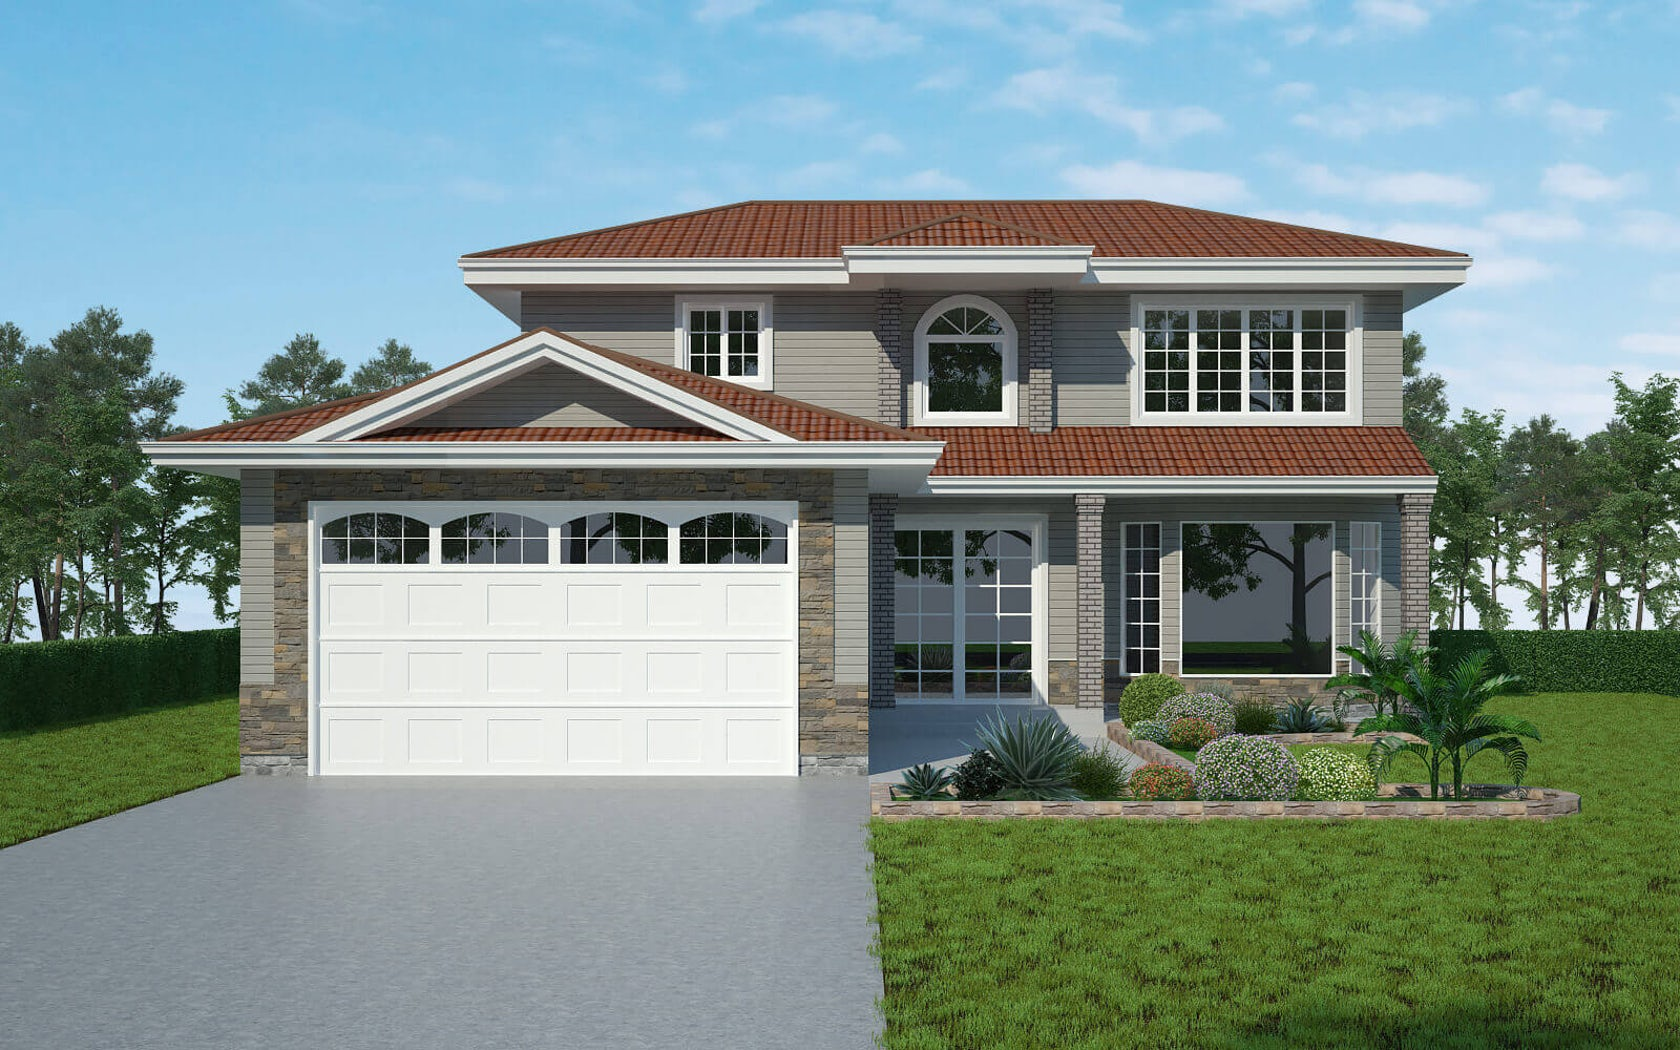 3d exterior home house design services architizer for Home design 3d gratis italiano